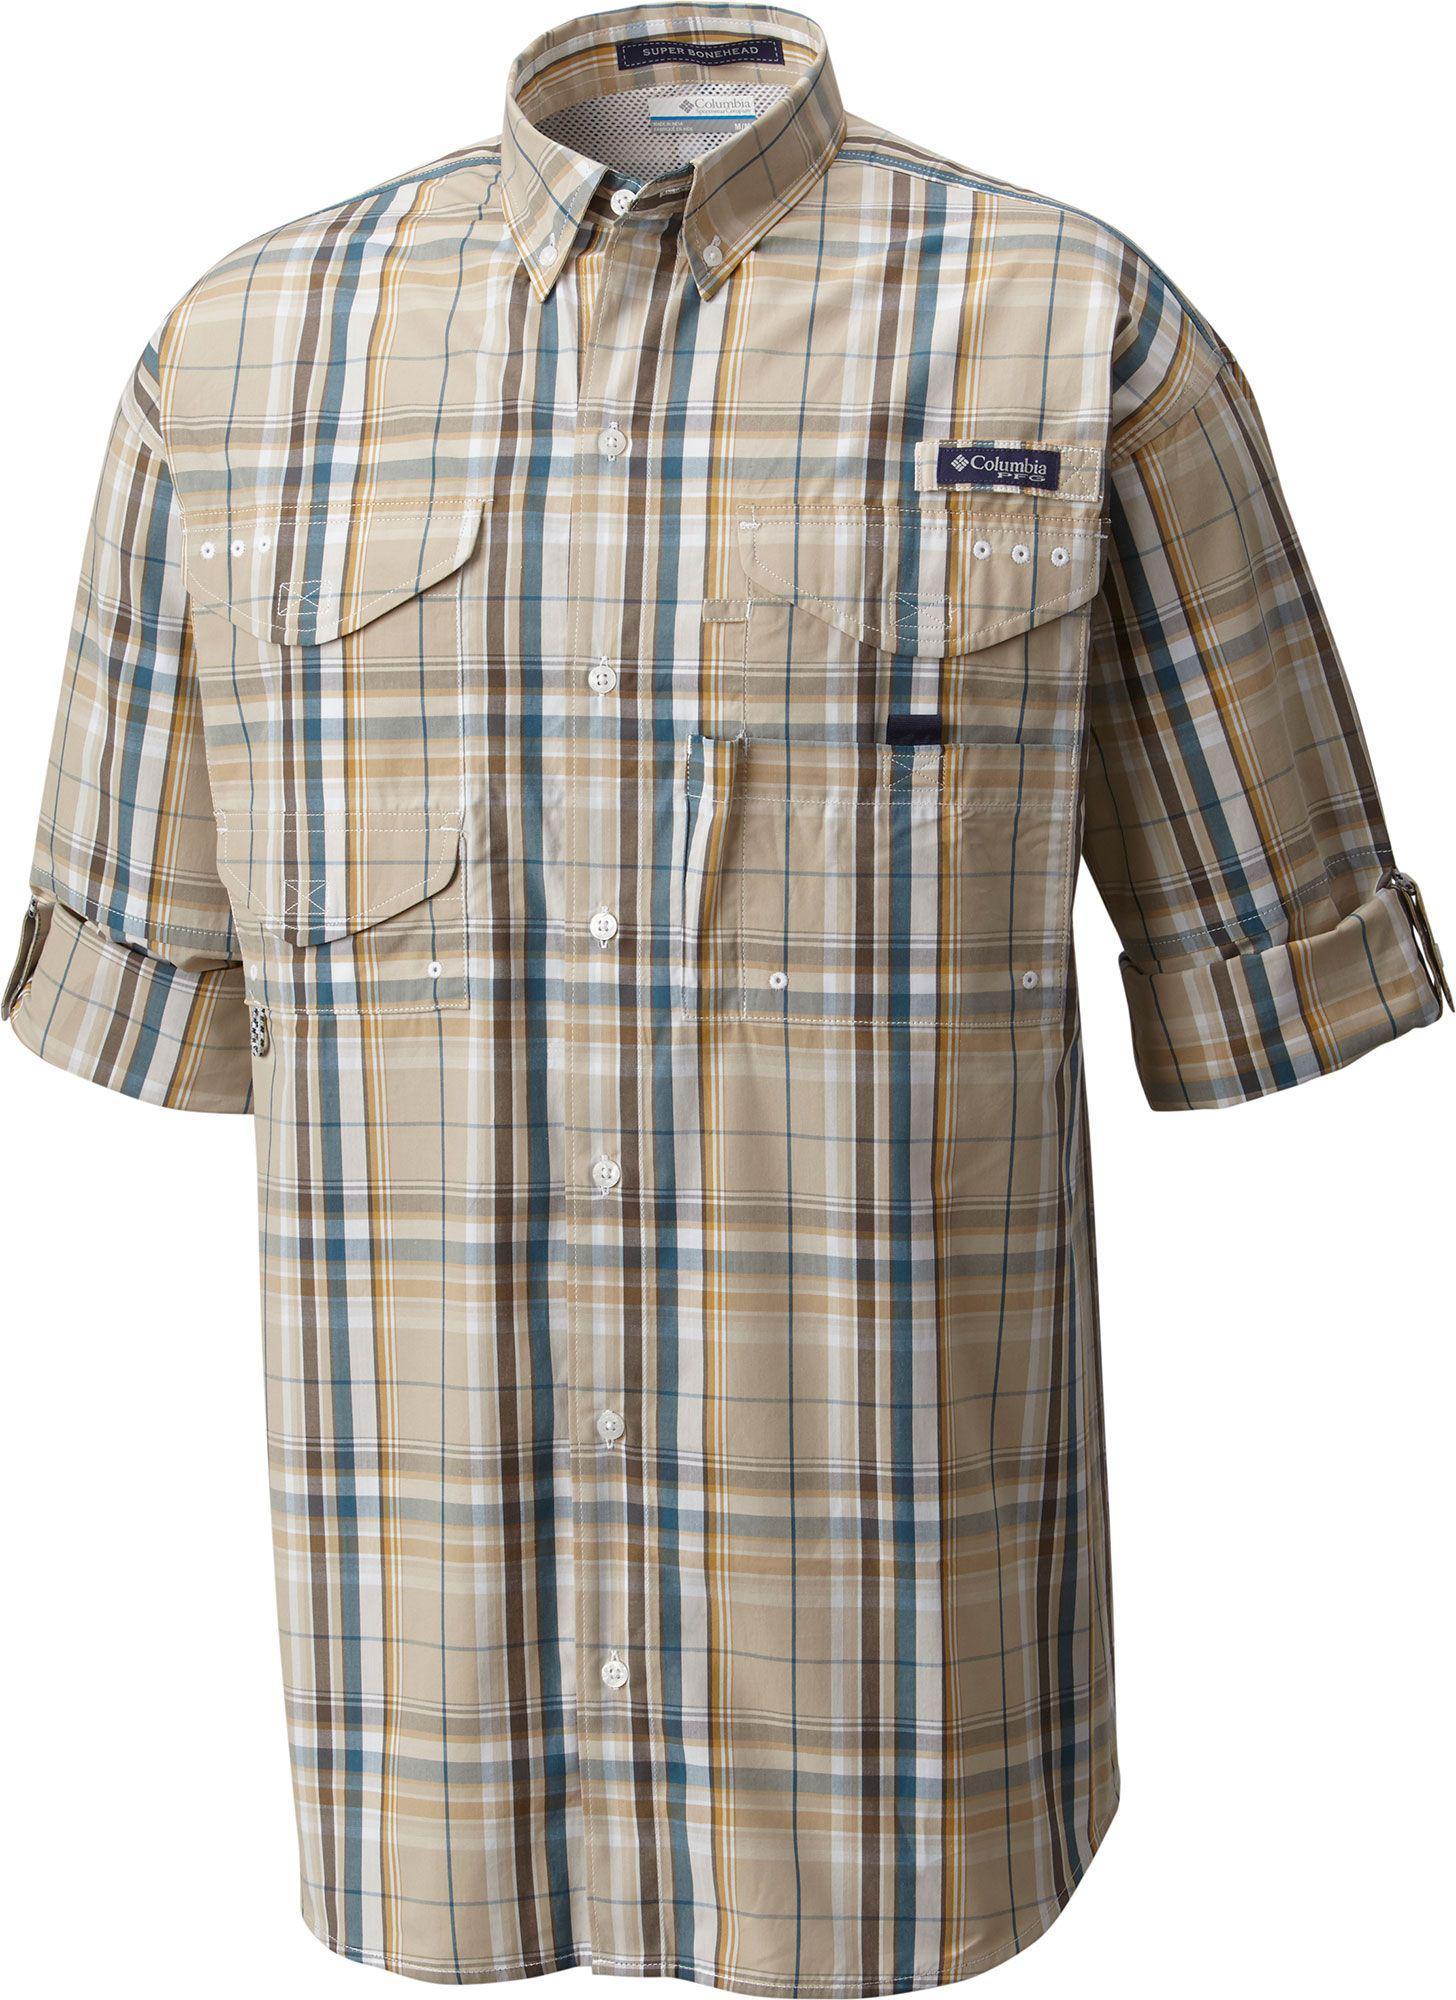 magellan angler fit fishing shirt - HD1456×2000